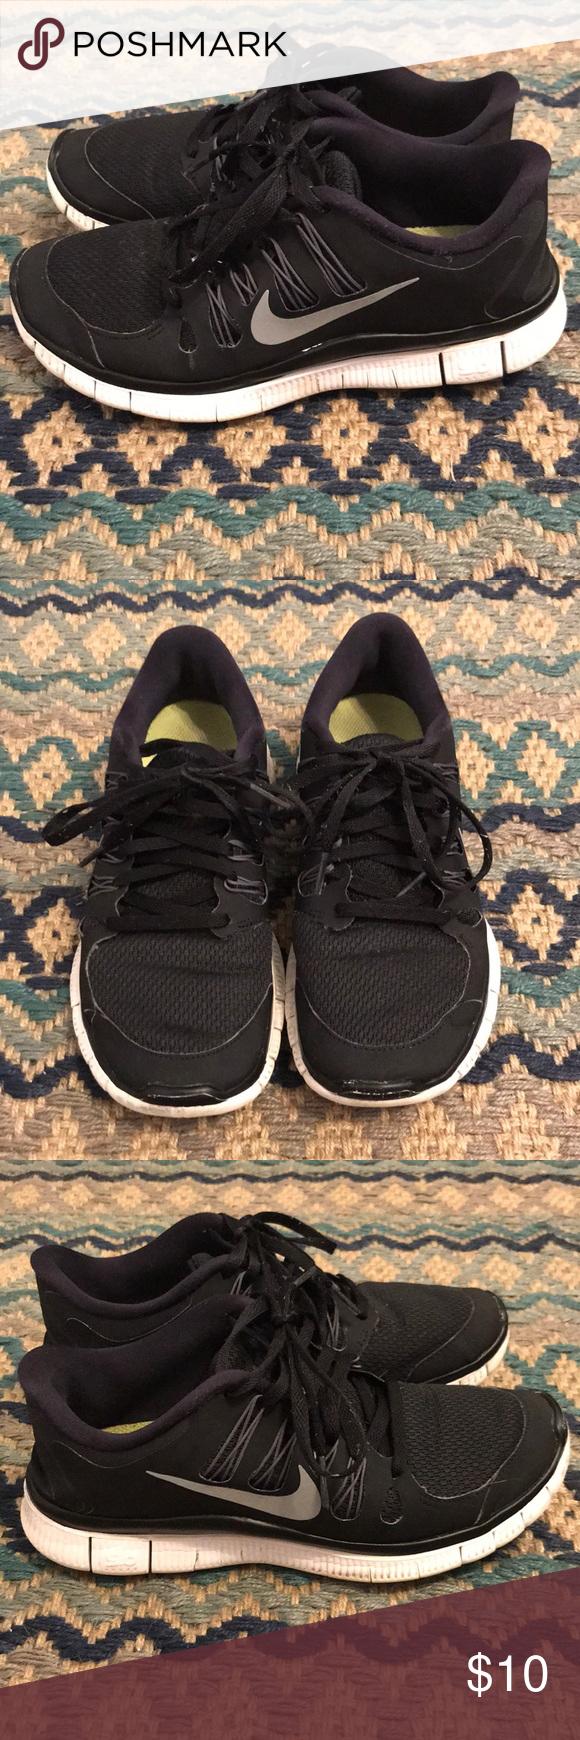 Nike Free sneakers Black Nike Free 5.0 running shoes. In